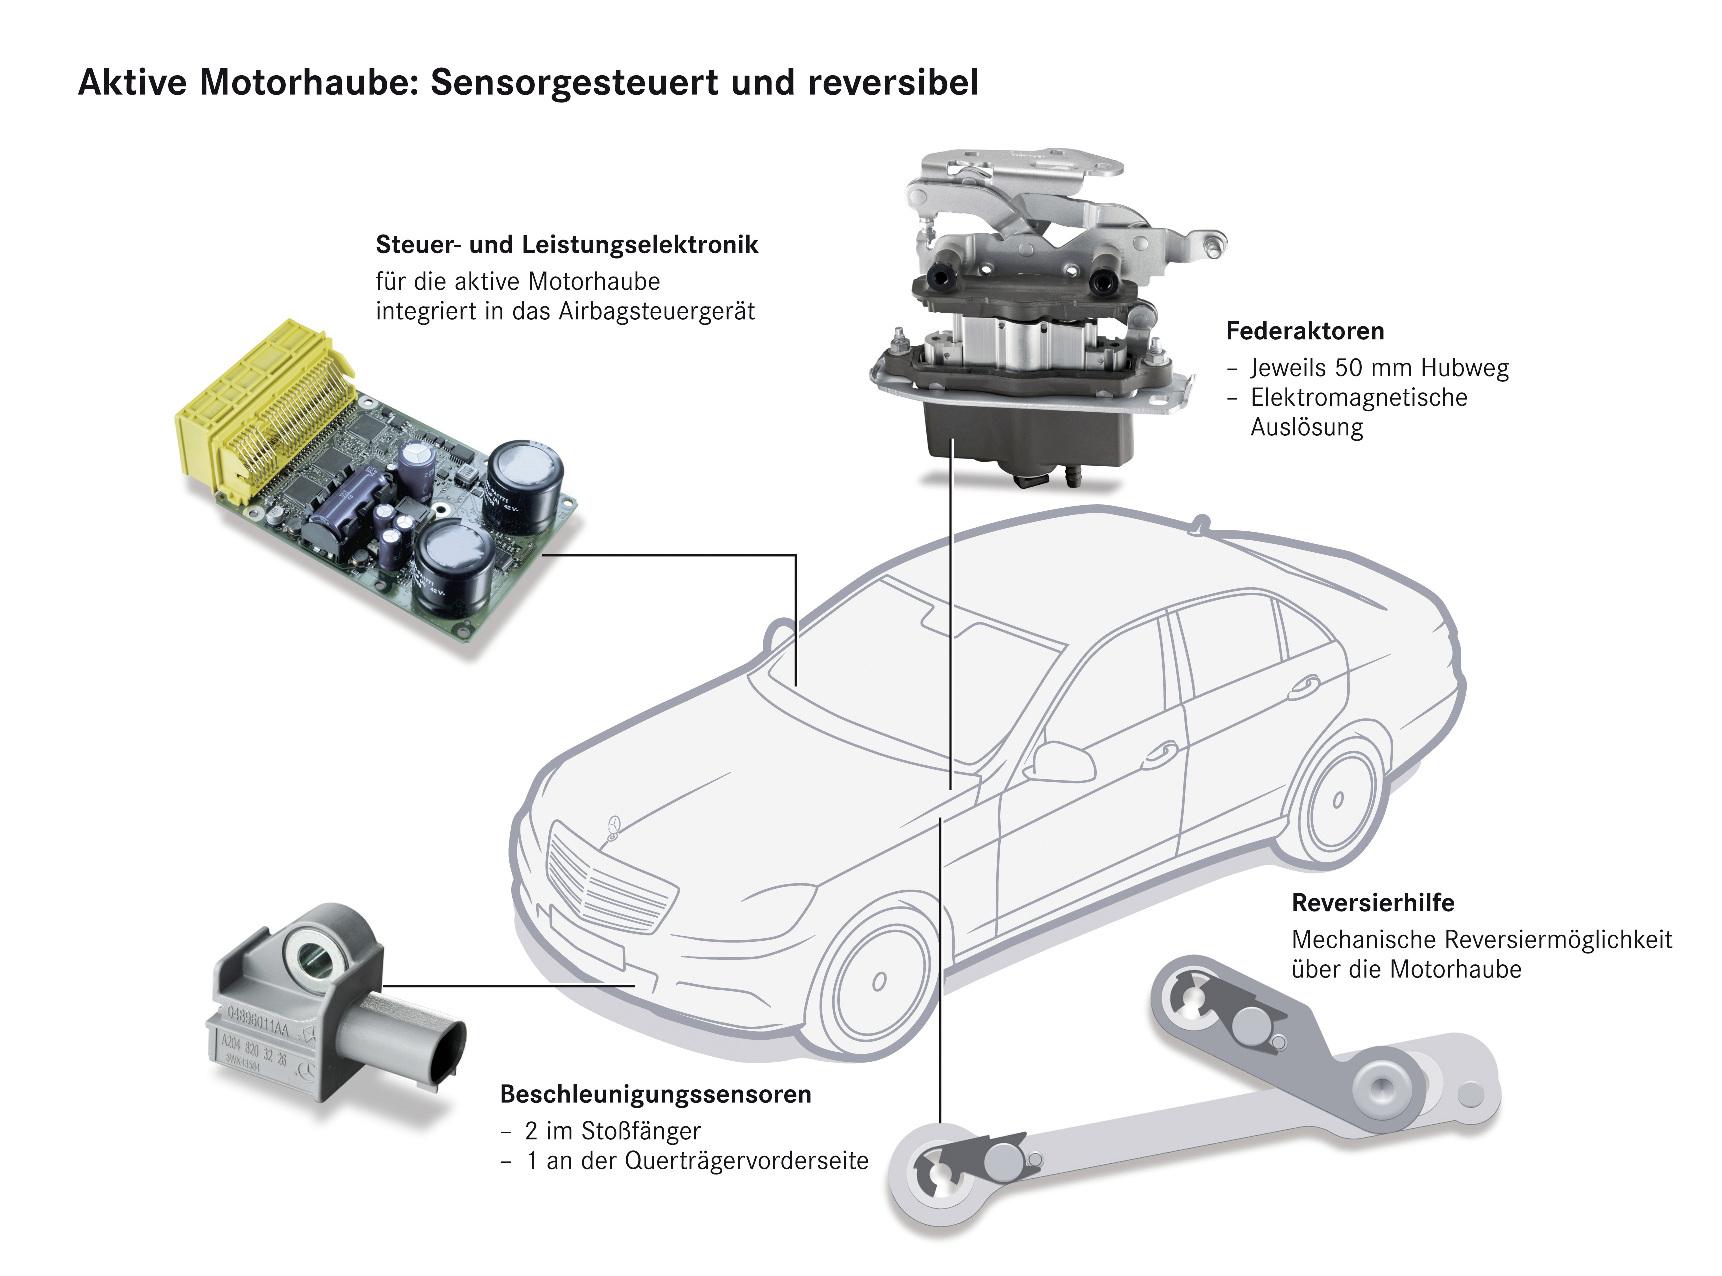 Mercedes-Benz E-Klasse hat die beste Rohbaukarosserie - Auto ...